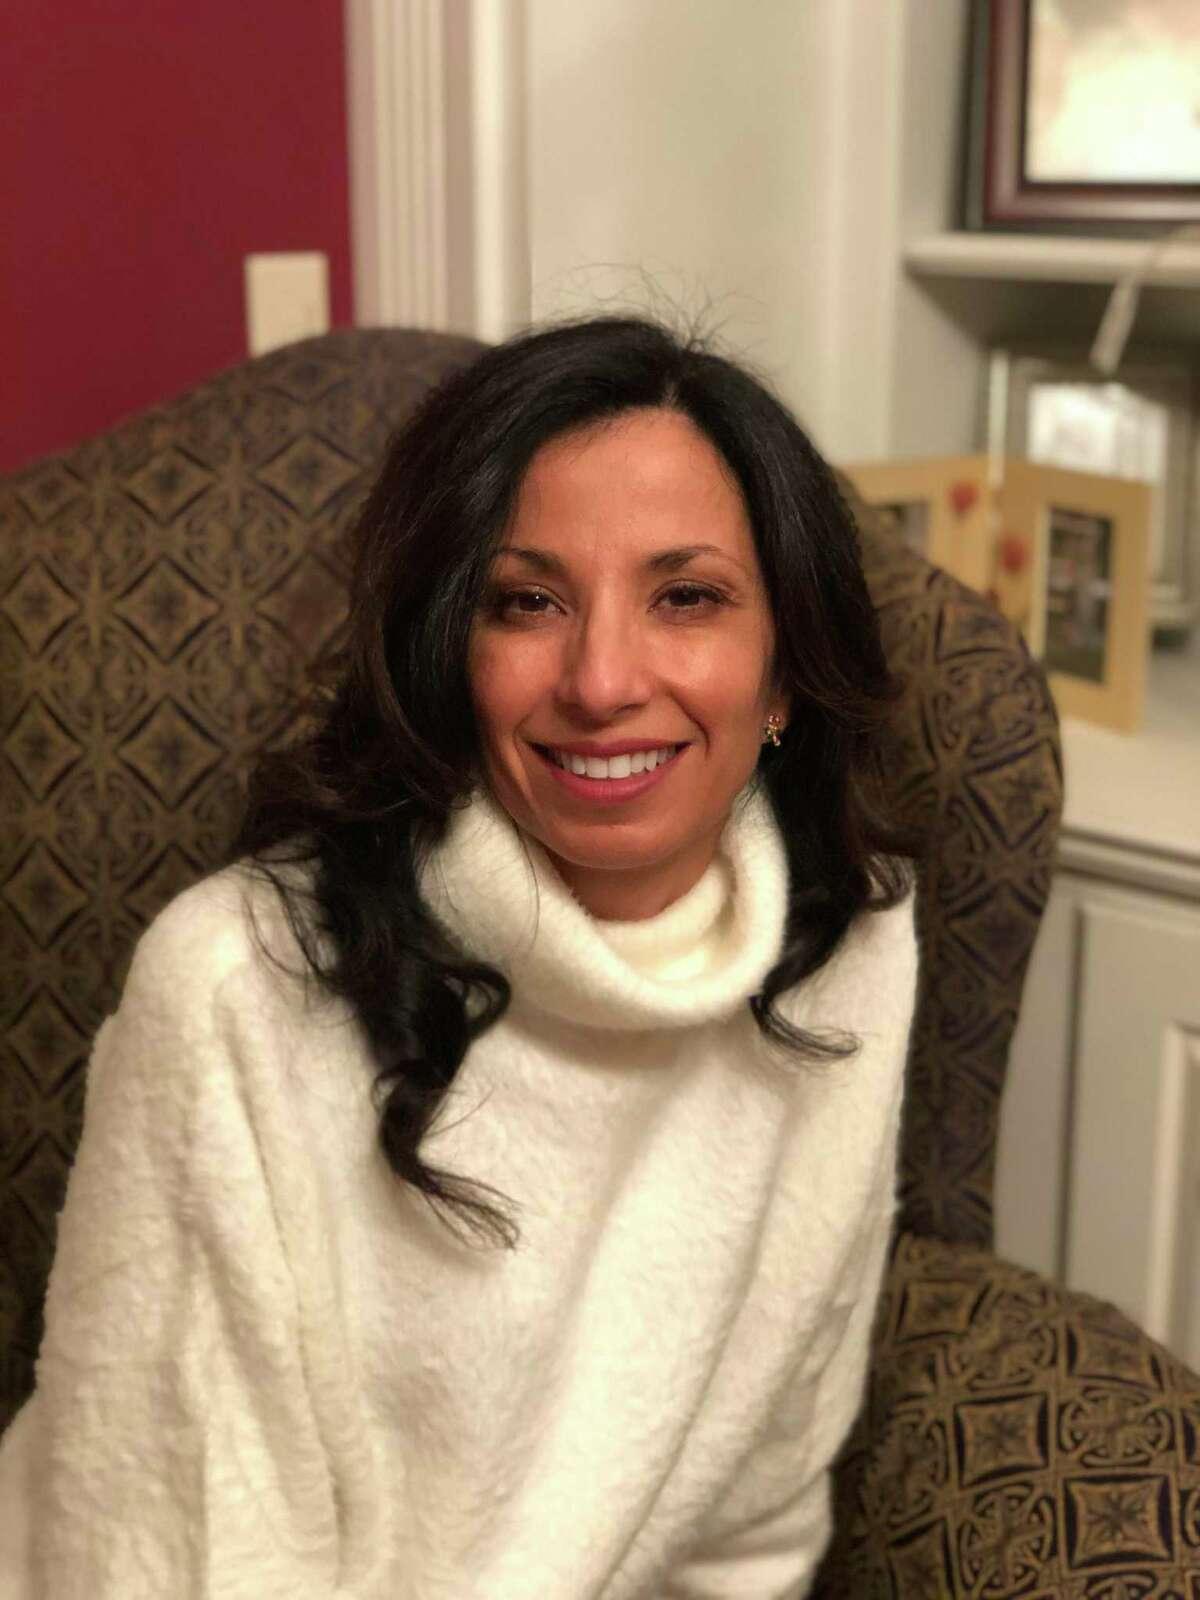 Ridgefield Superintendent of Schools Susie Da Silva